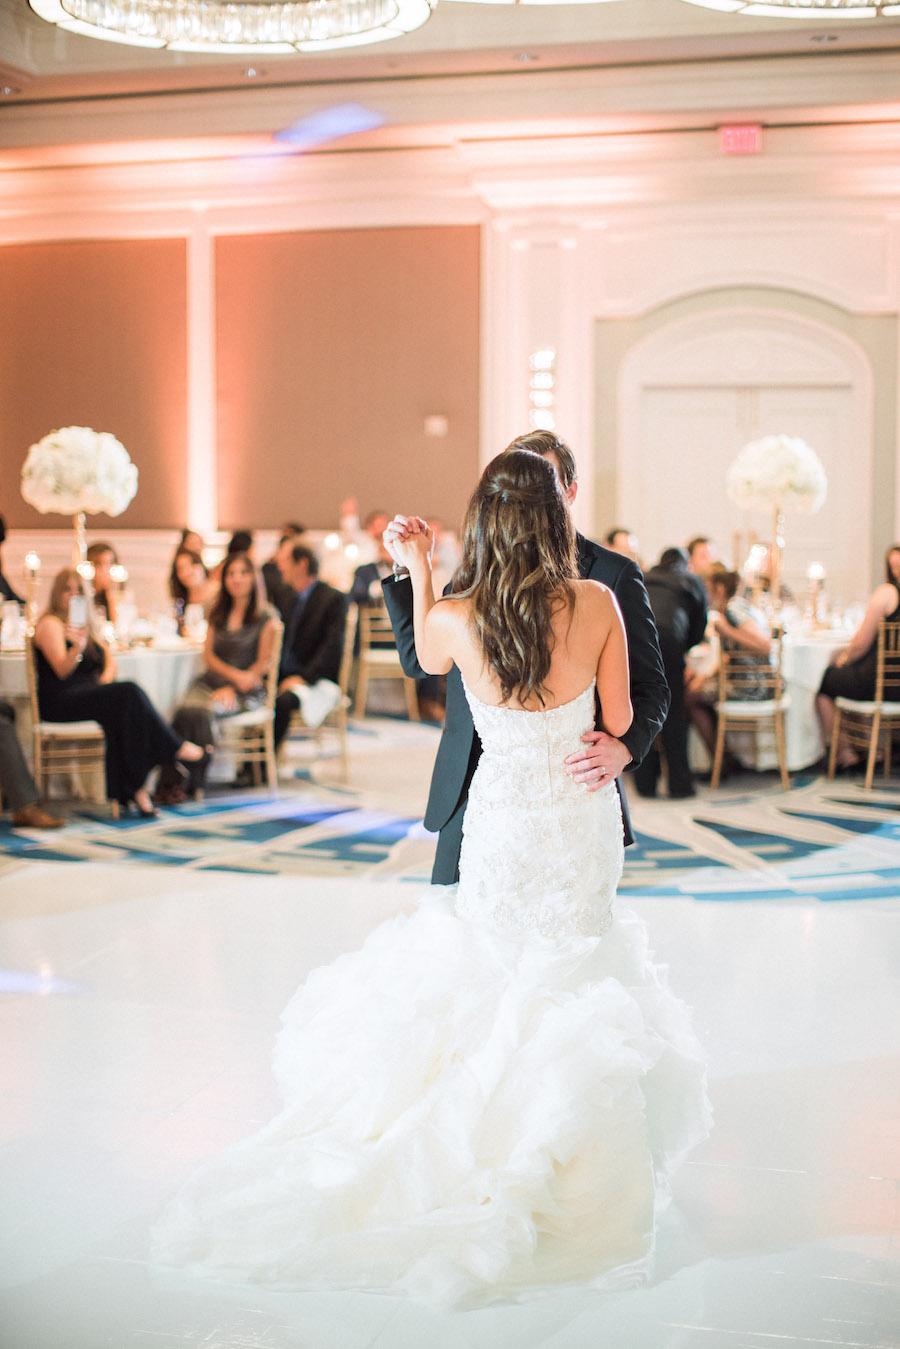 Bride and Groom First Dance on Wedding Day Portrait in Sarasota FL